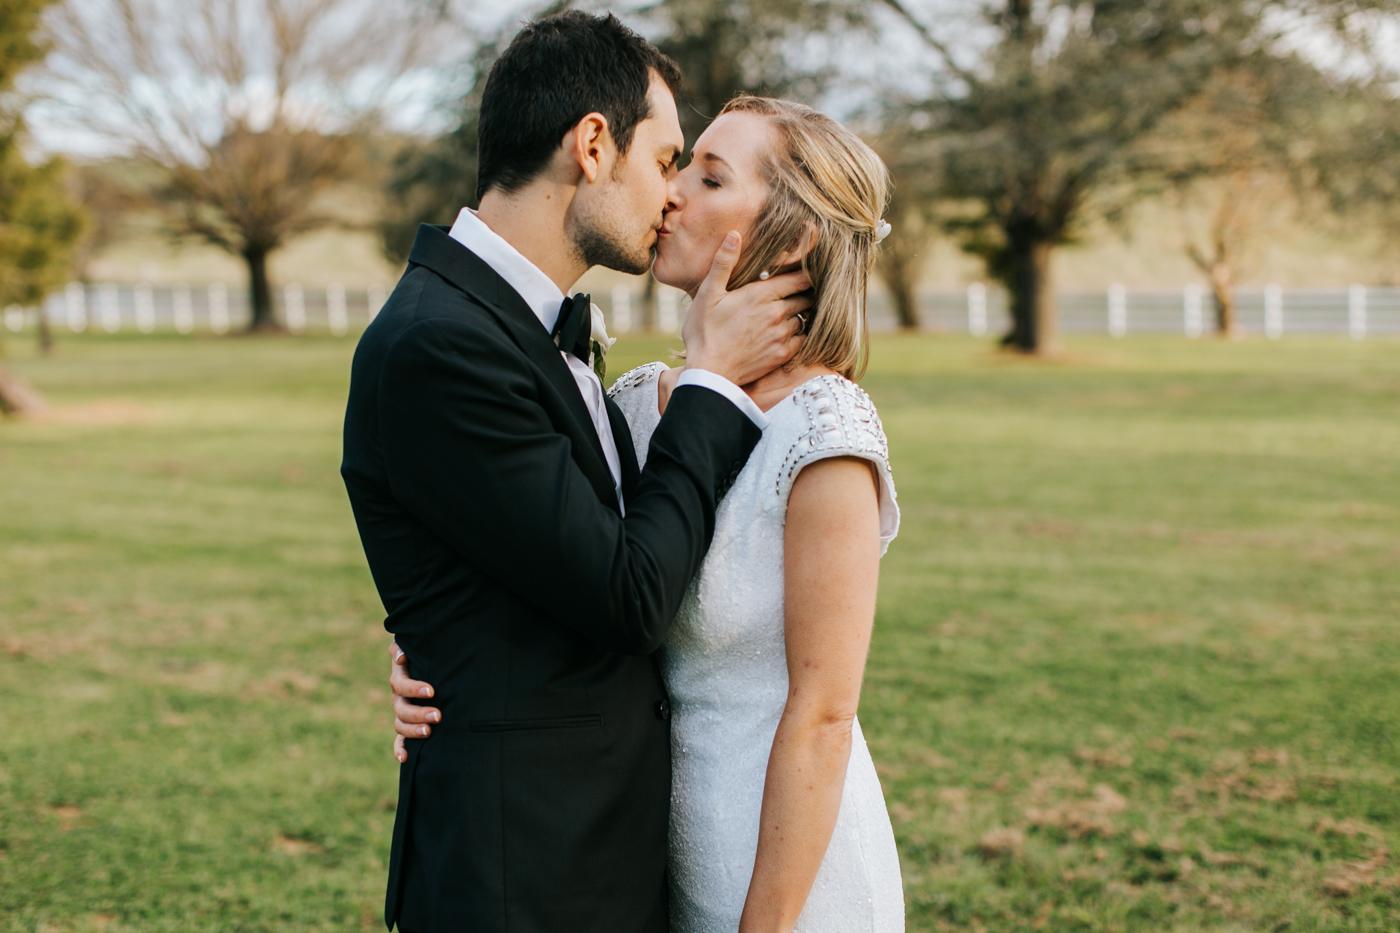 Bridget & James - Orange Country Wedding - Samantha Heather Photography-161.jpg